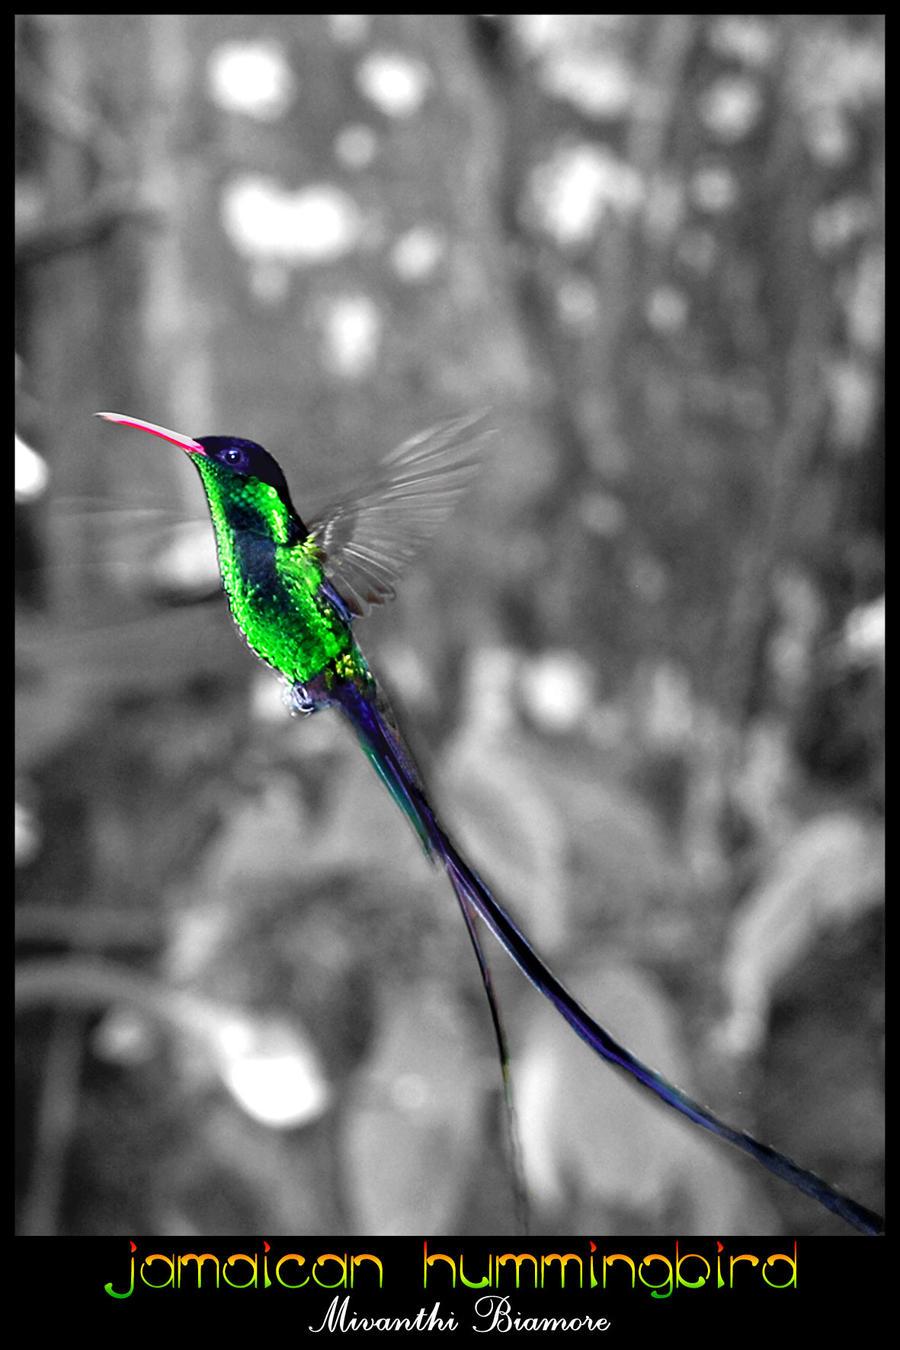 jamaican hummingbird by mivanthi on deviantart. Black Bedroom Furniture Sets. Home Design Ideas